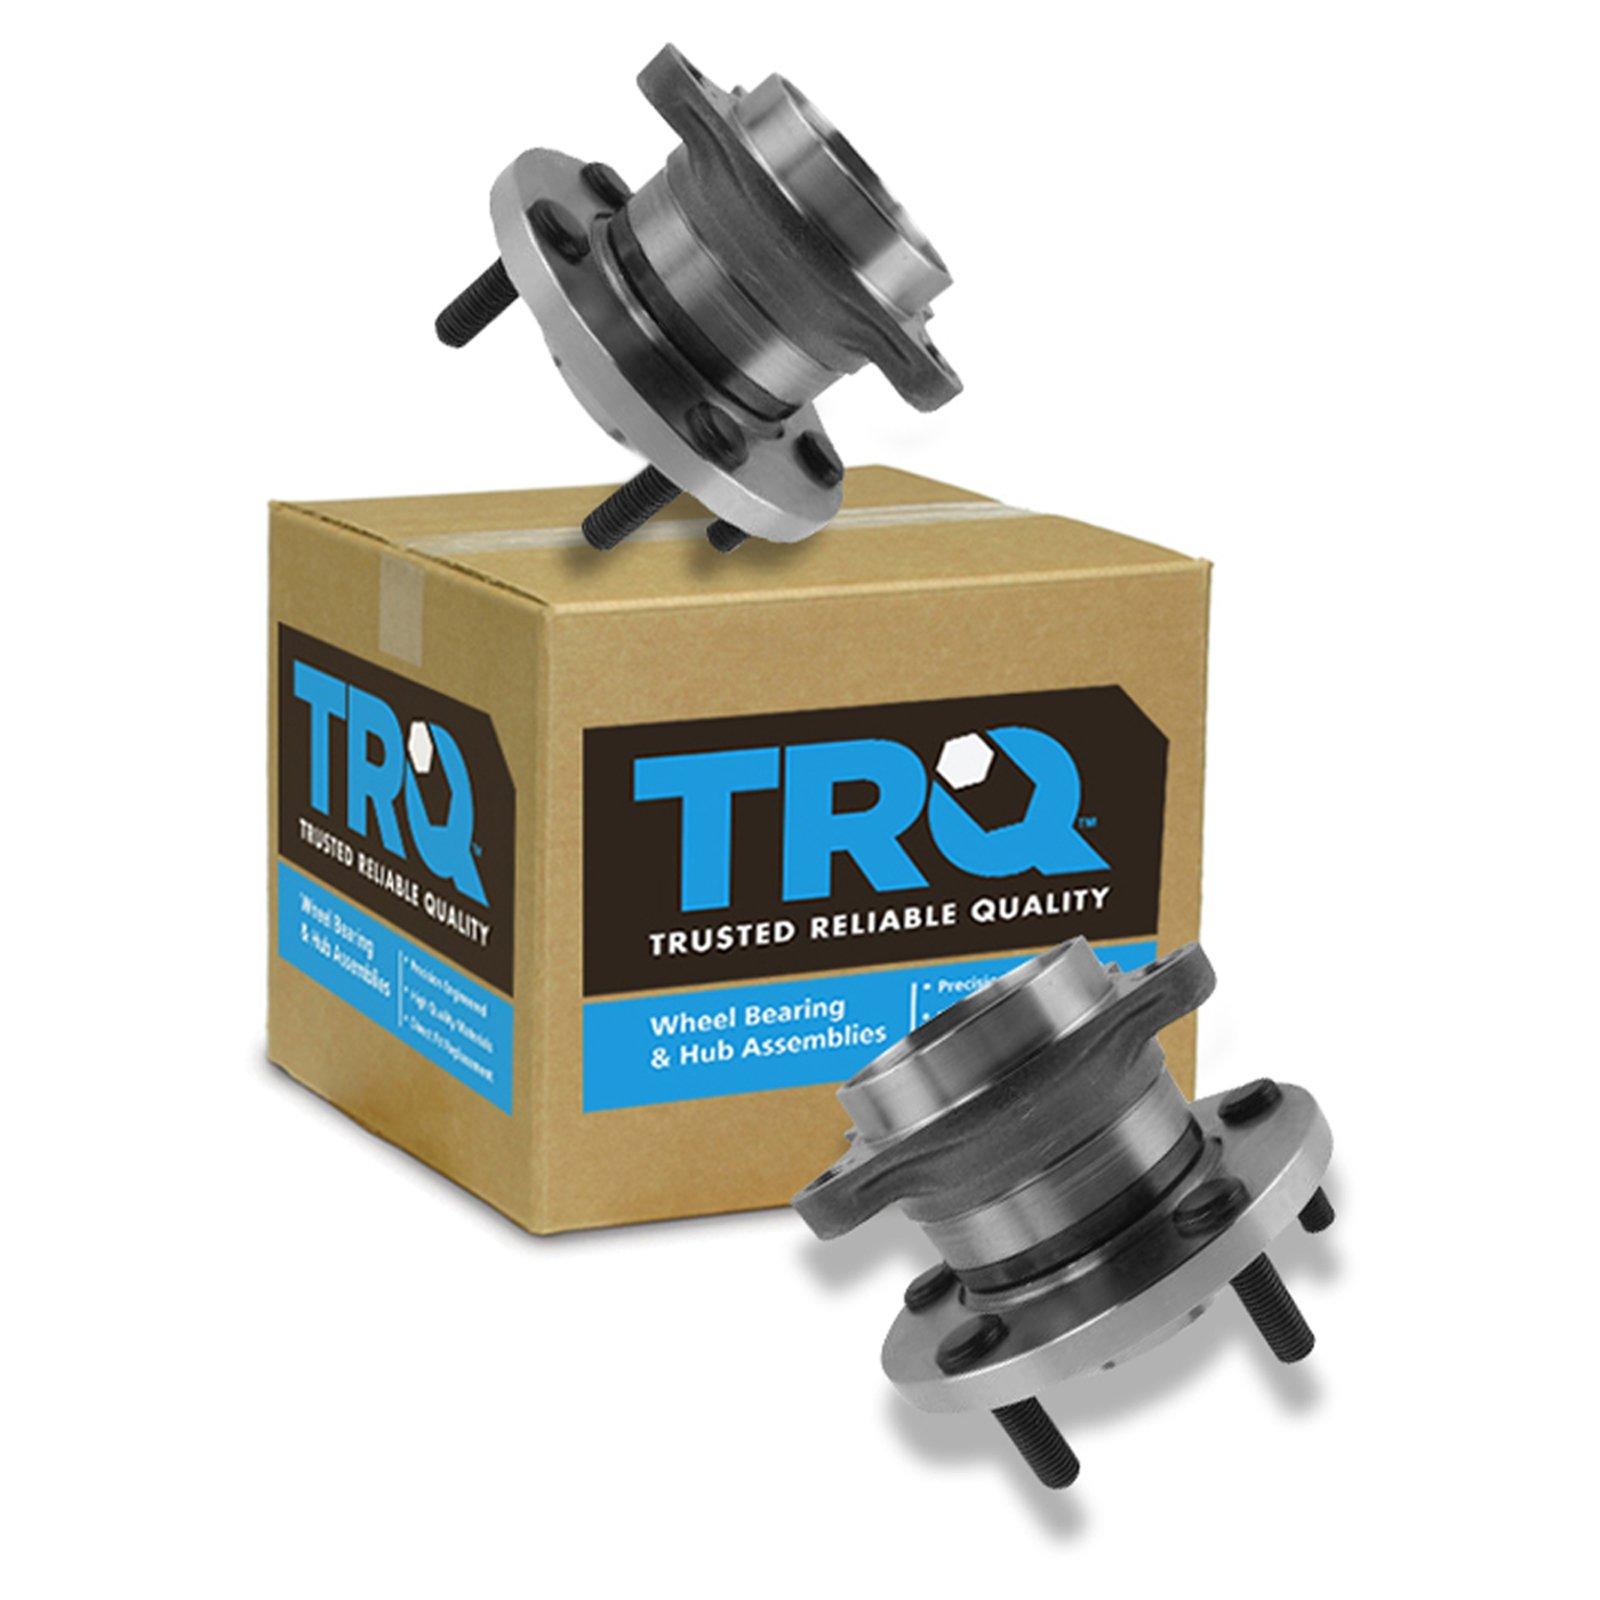 TRQ Wheel Bearing & Hub Assembly Pair LH & RH Sides Rear for Mazda CX-9